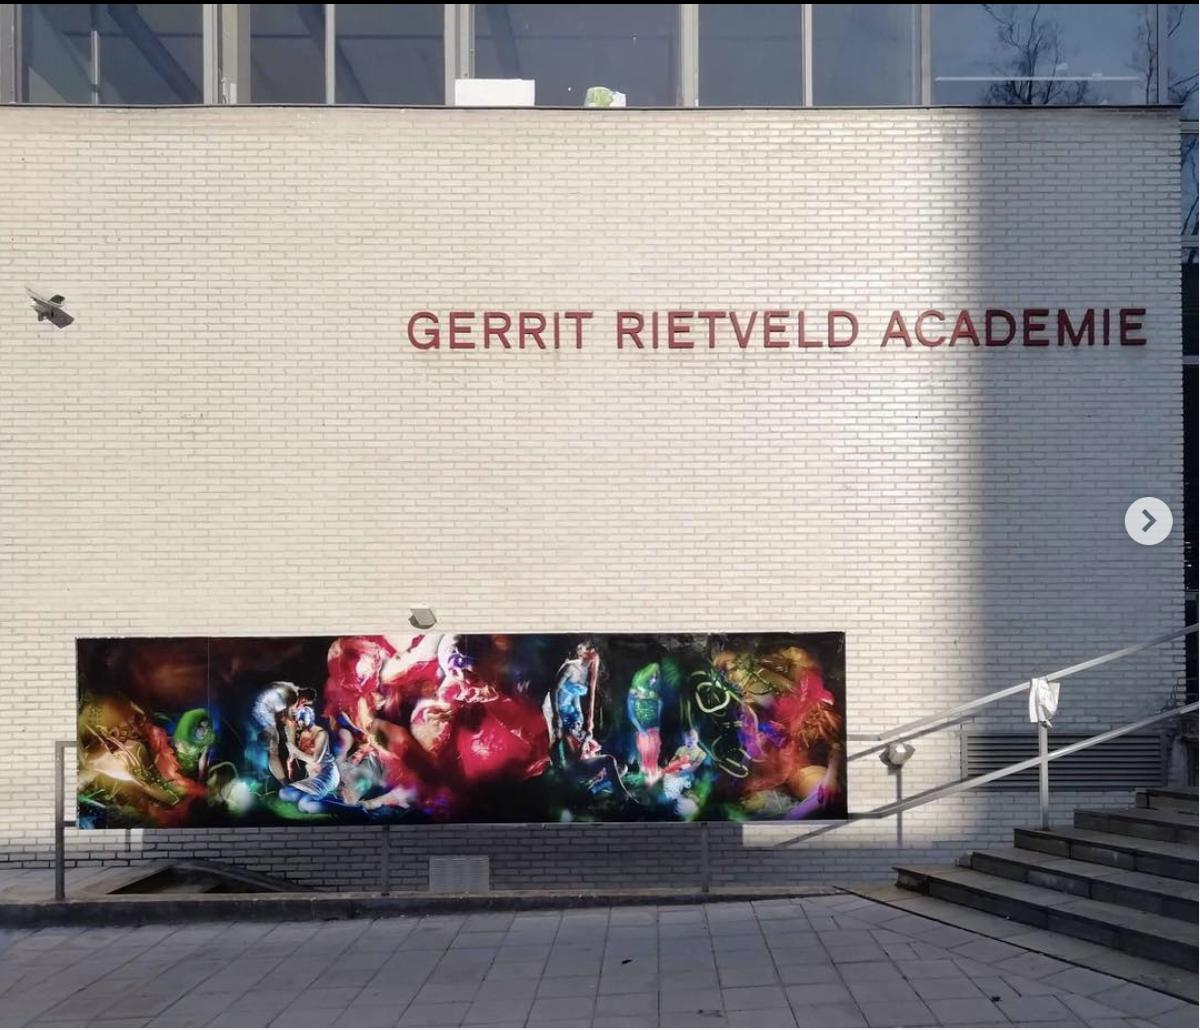 Documentation of billboard